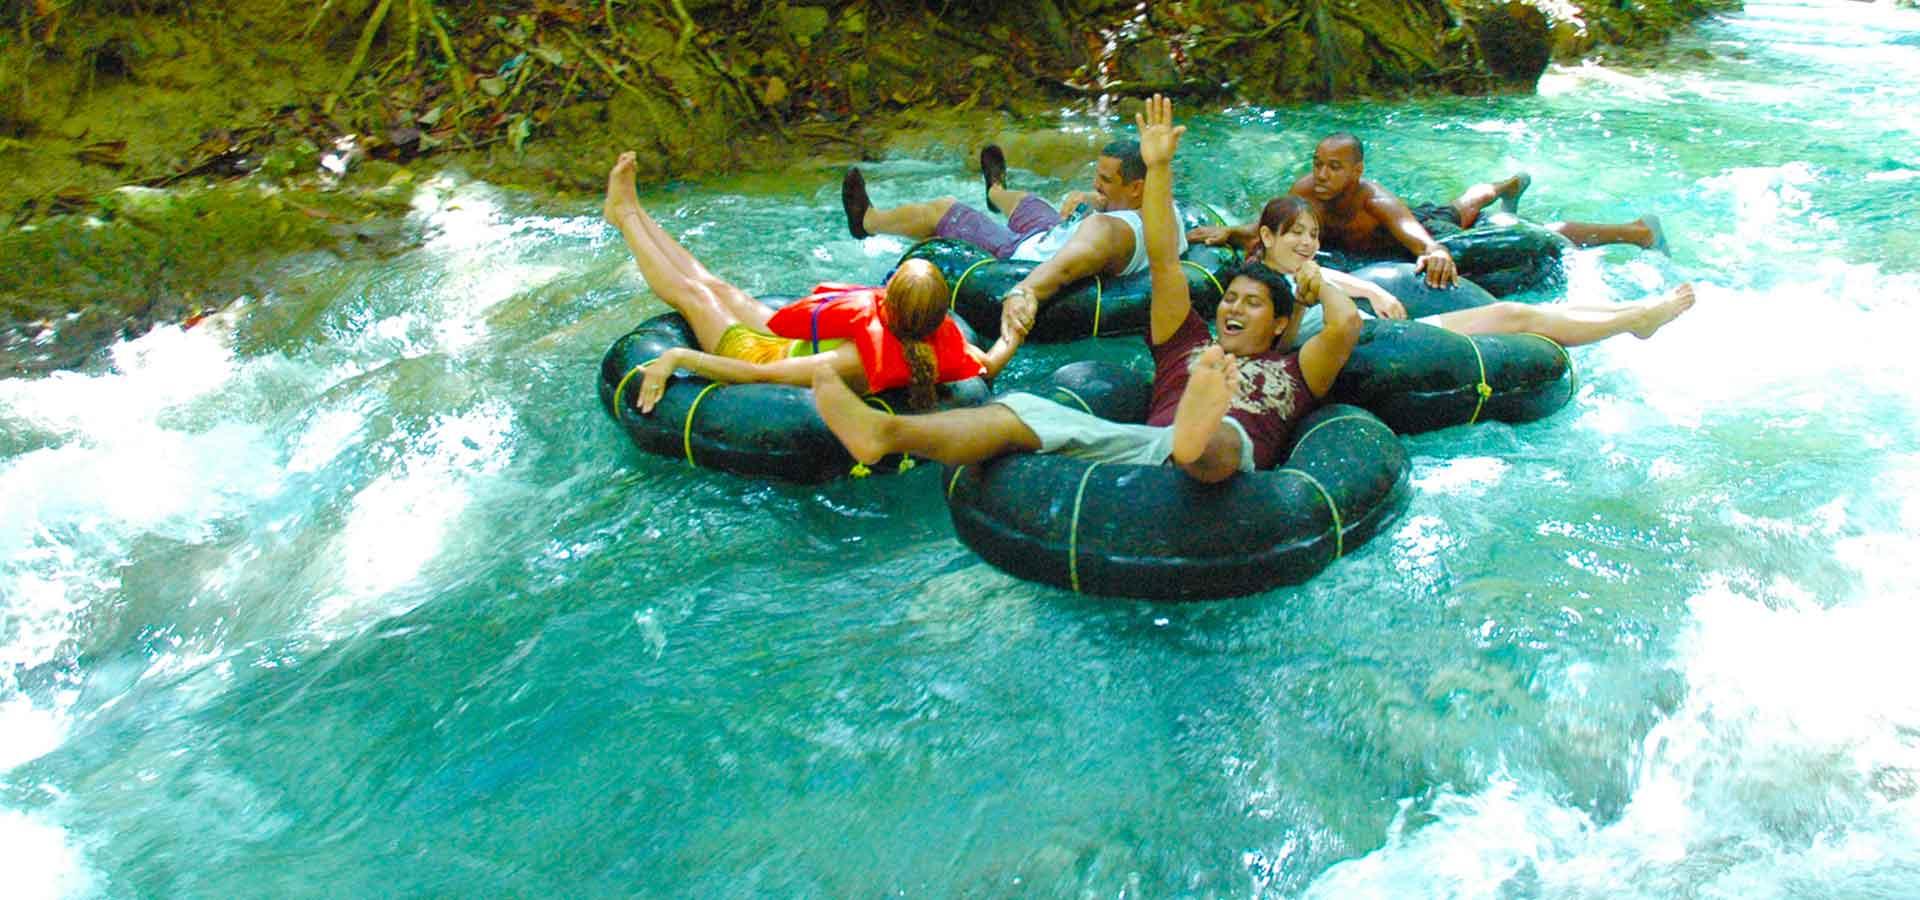 tourist enjoying their river tubing adventure in Ocho Rios